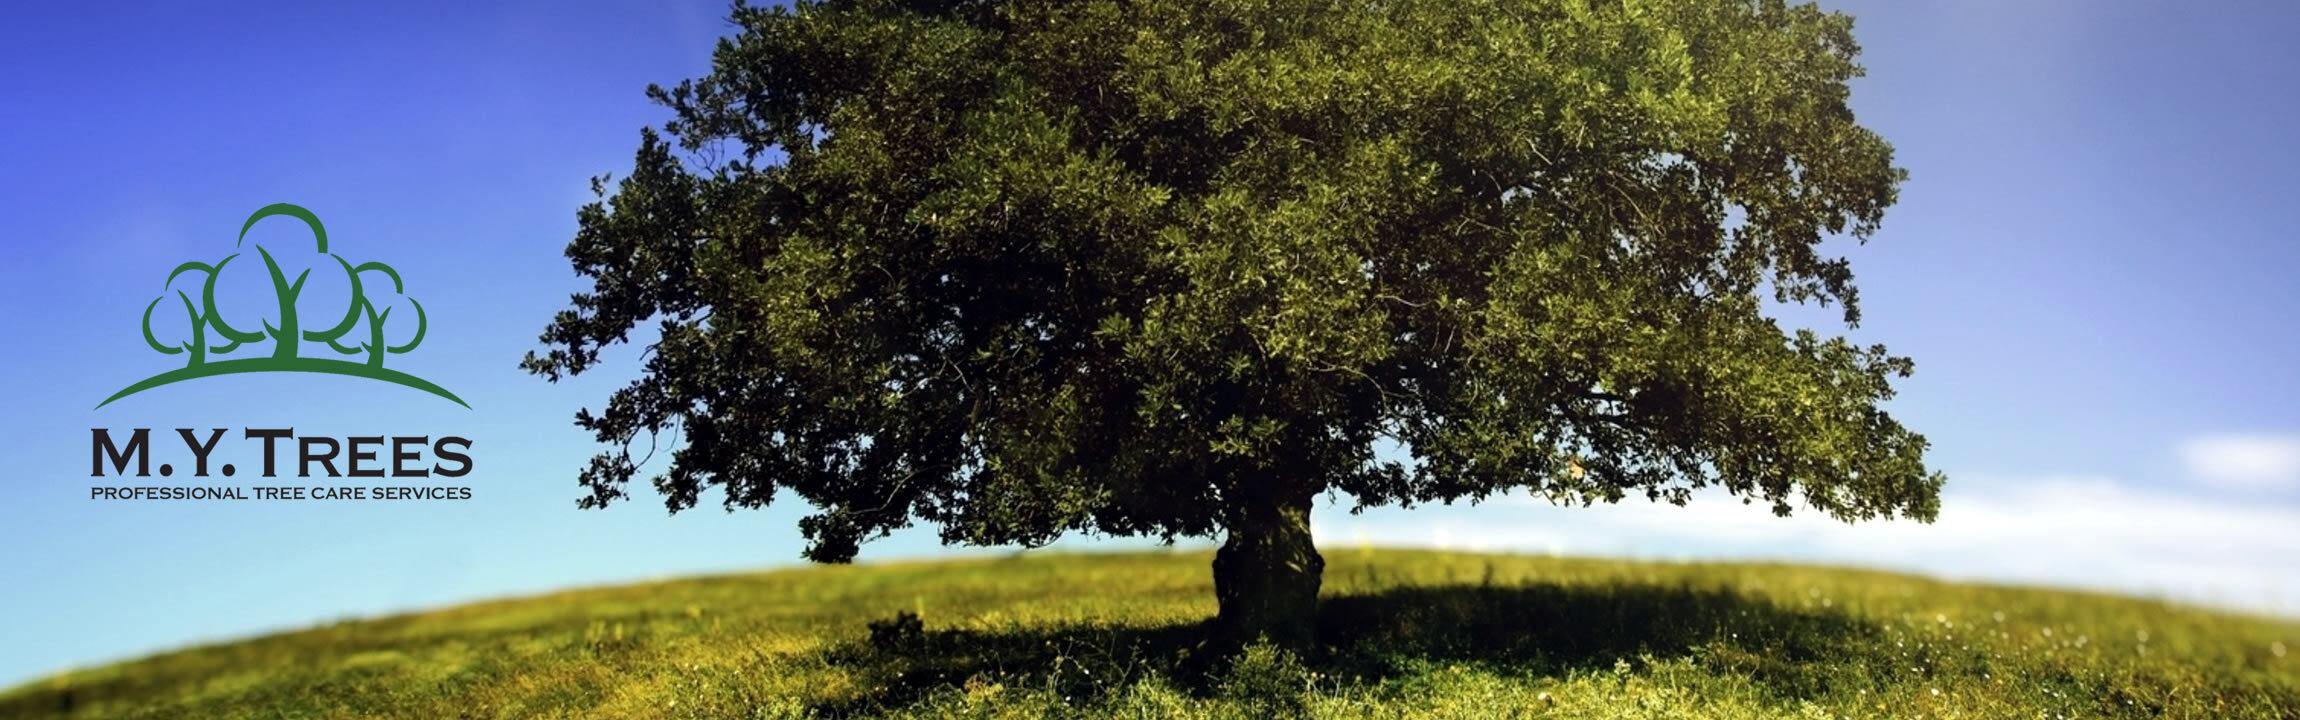 M.Y. Trees